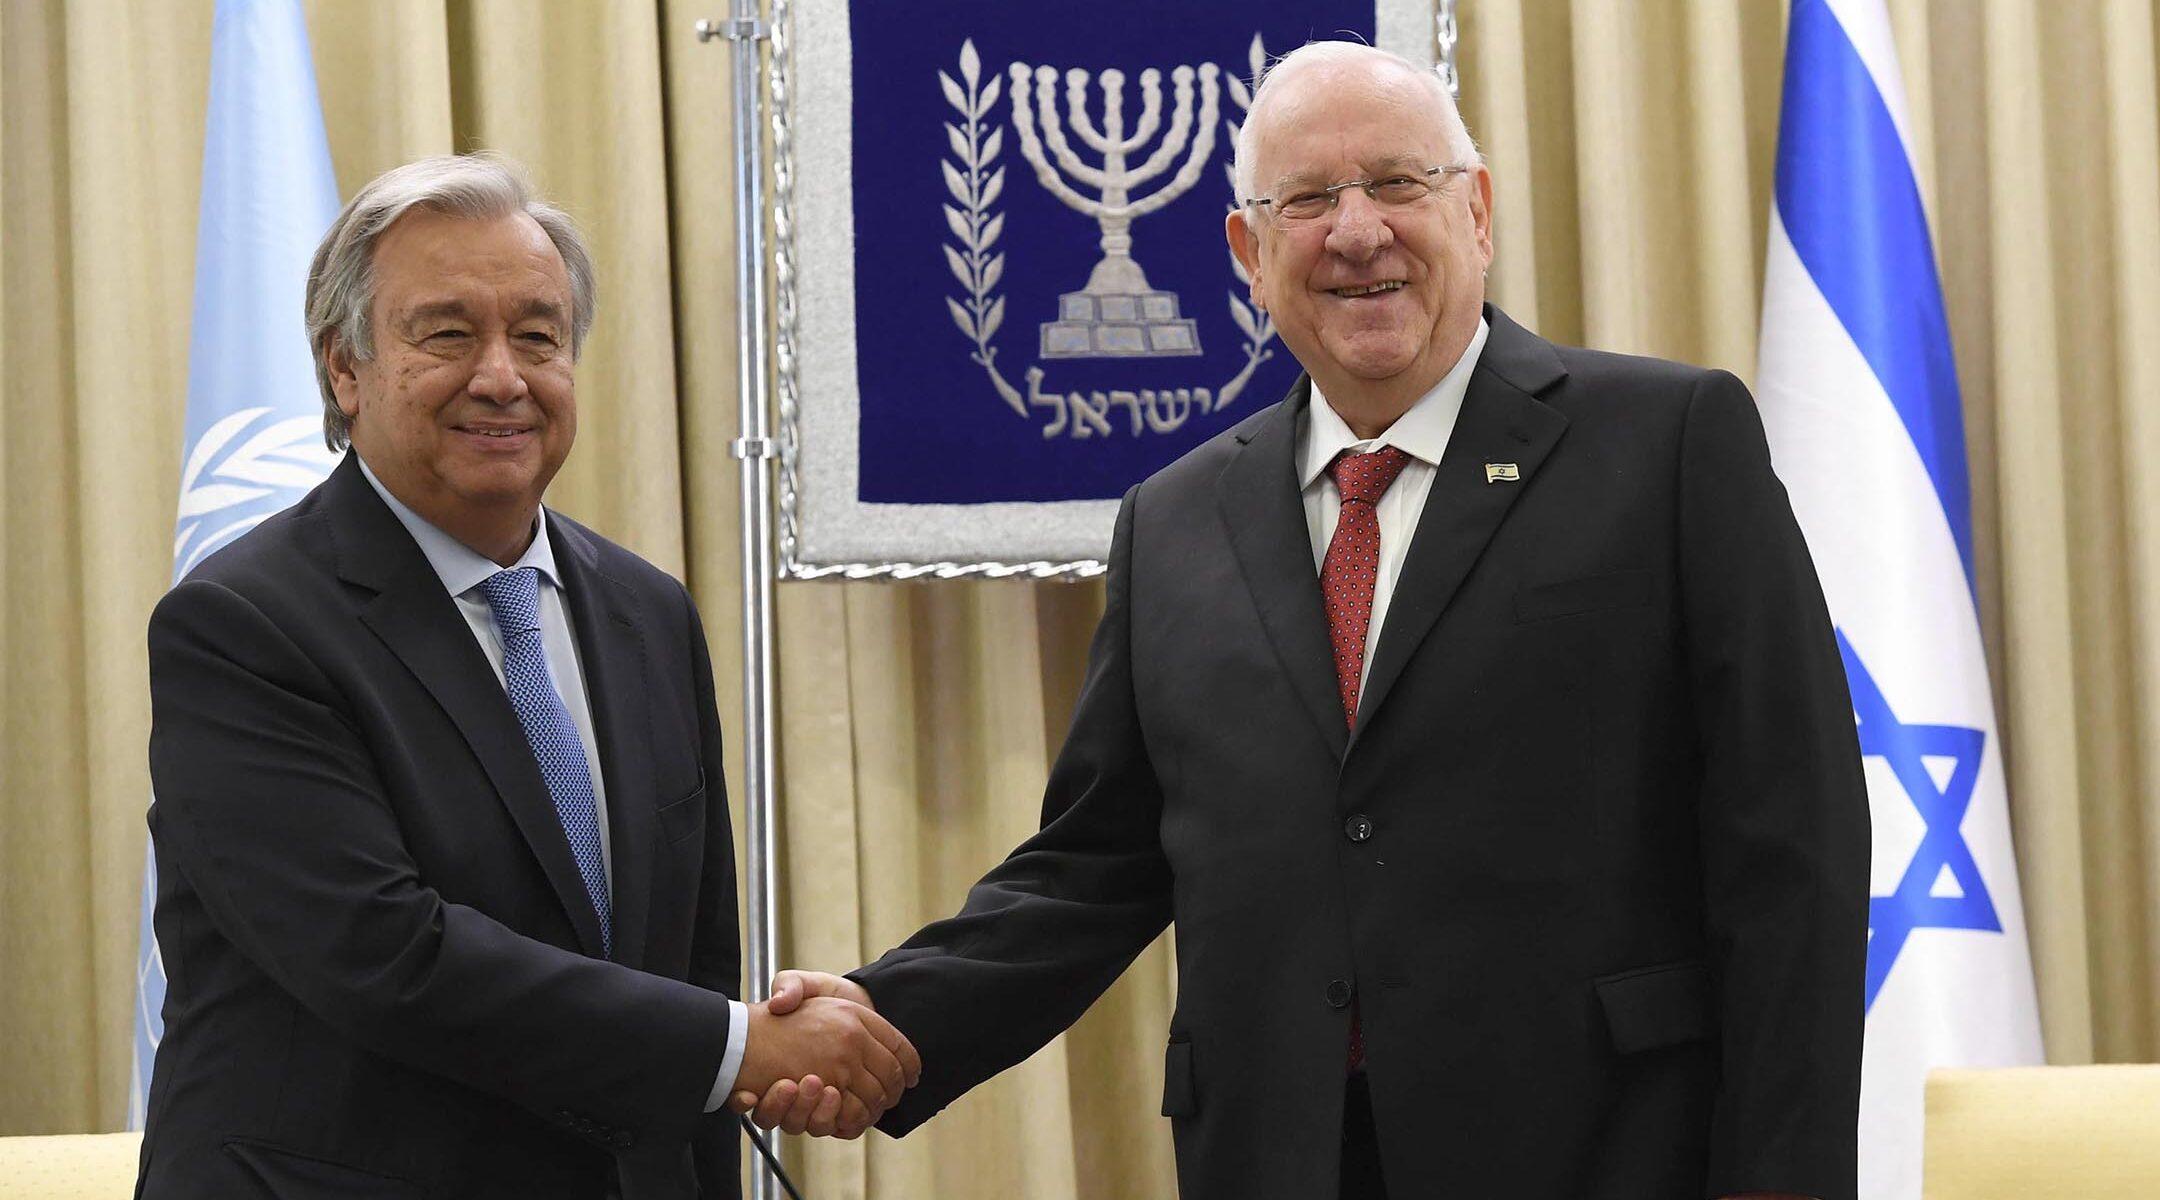 Reuven Rivlin and Antonio Guterres, left, meet in Jerusalem, Israel on Aug. 28, 2017. (Amos Ben Gershom/GPO)